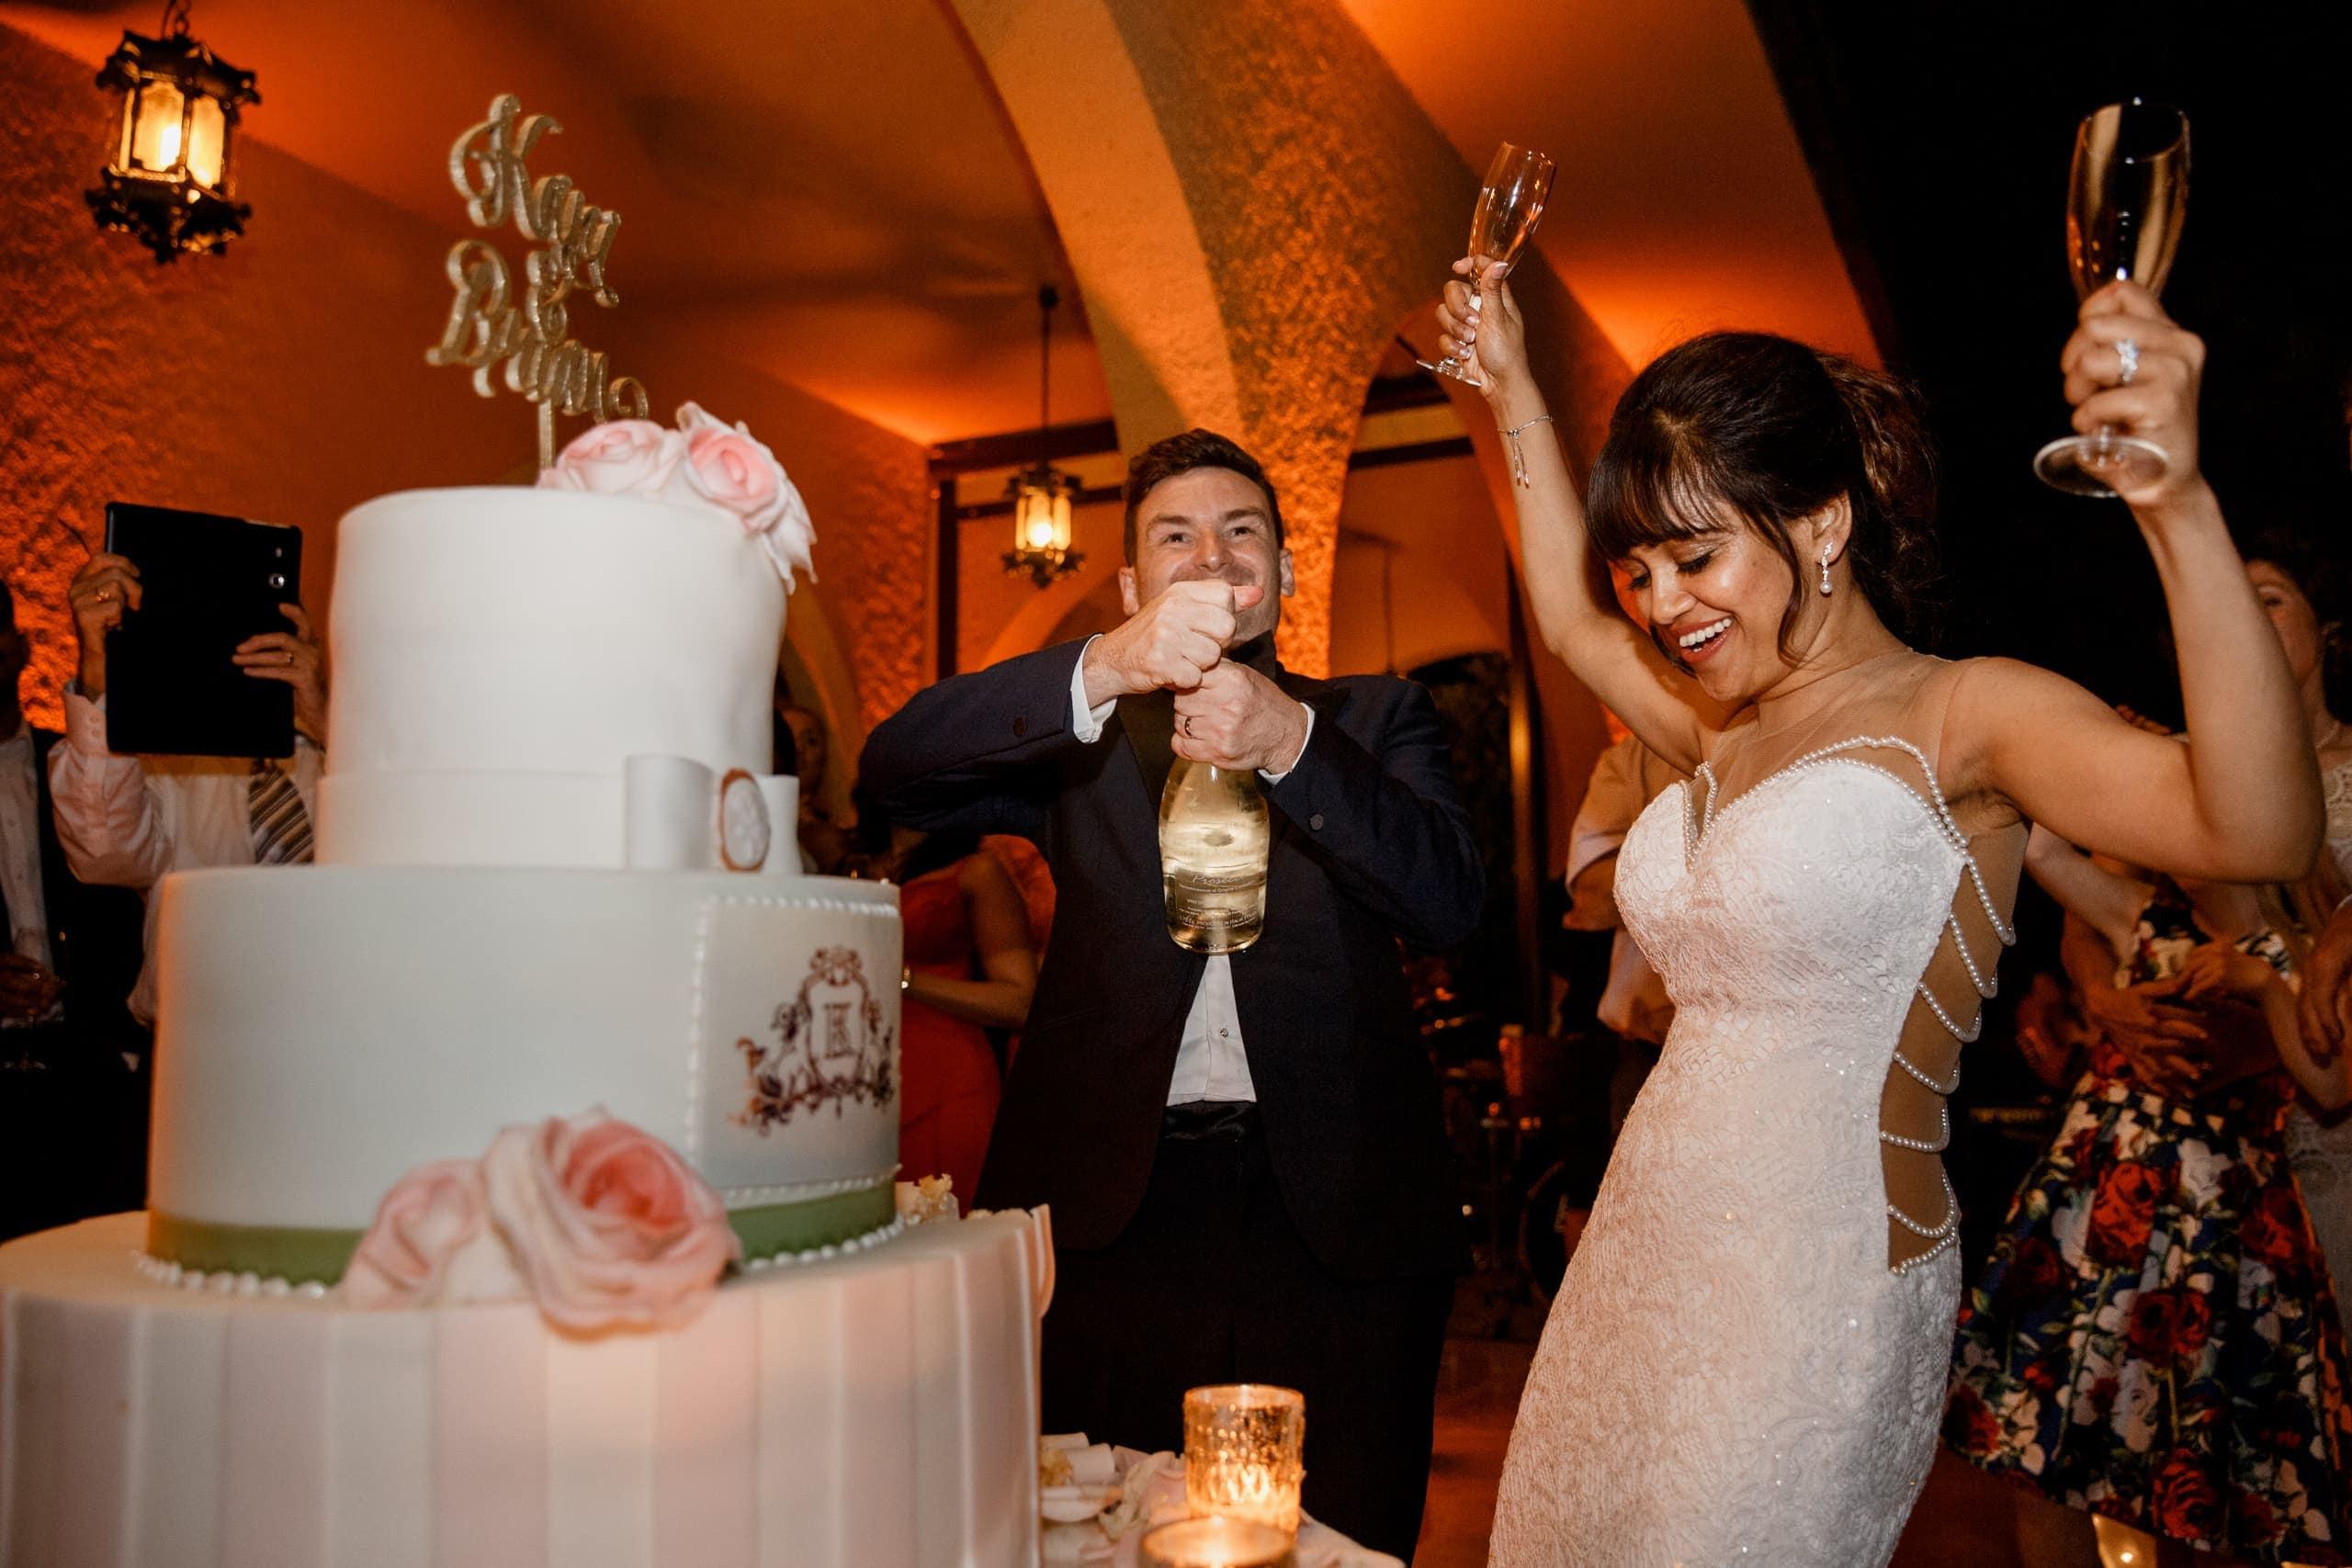 cake cut at lake como wedding in italy